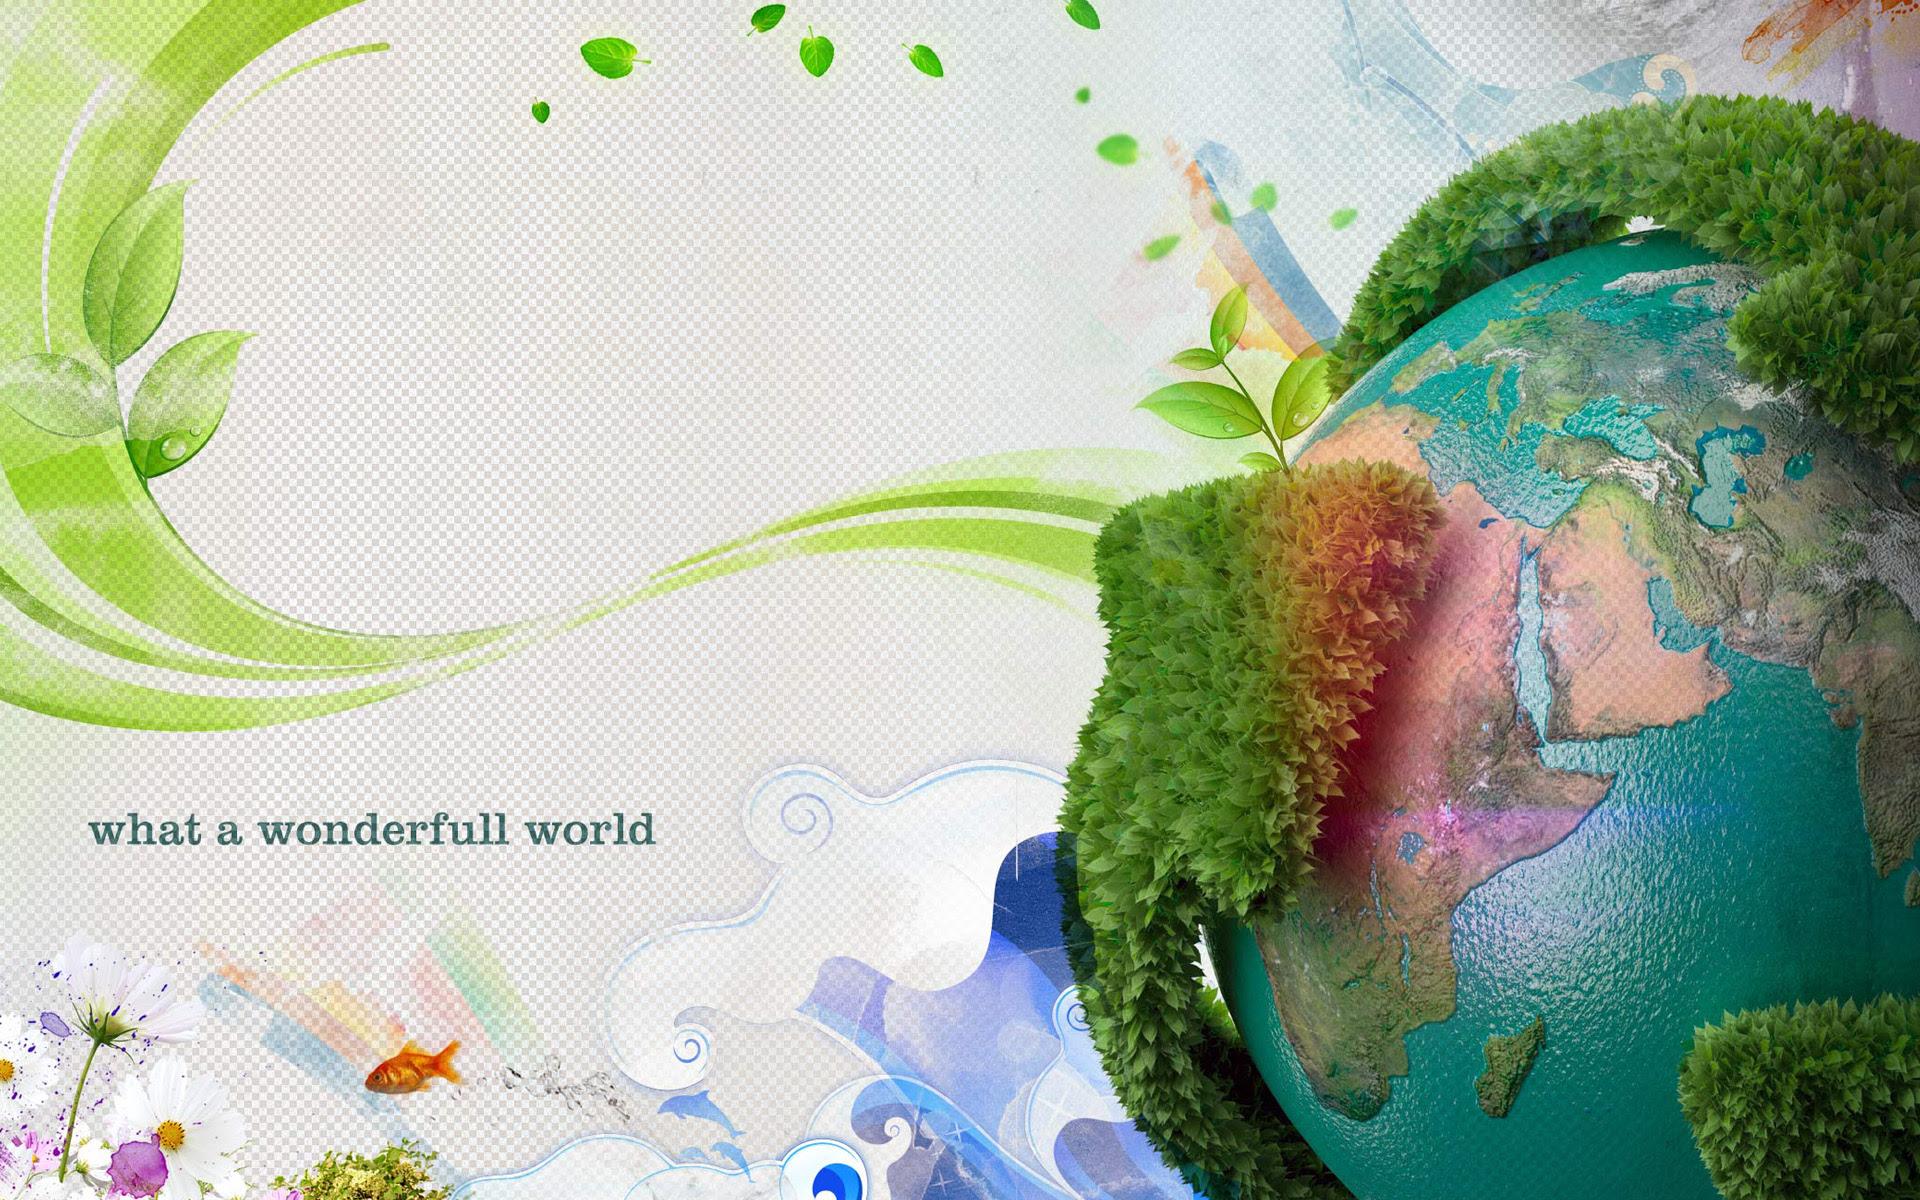 wallpaper earth day